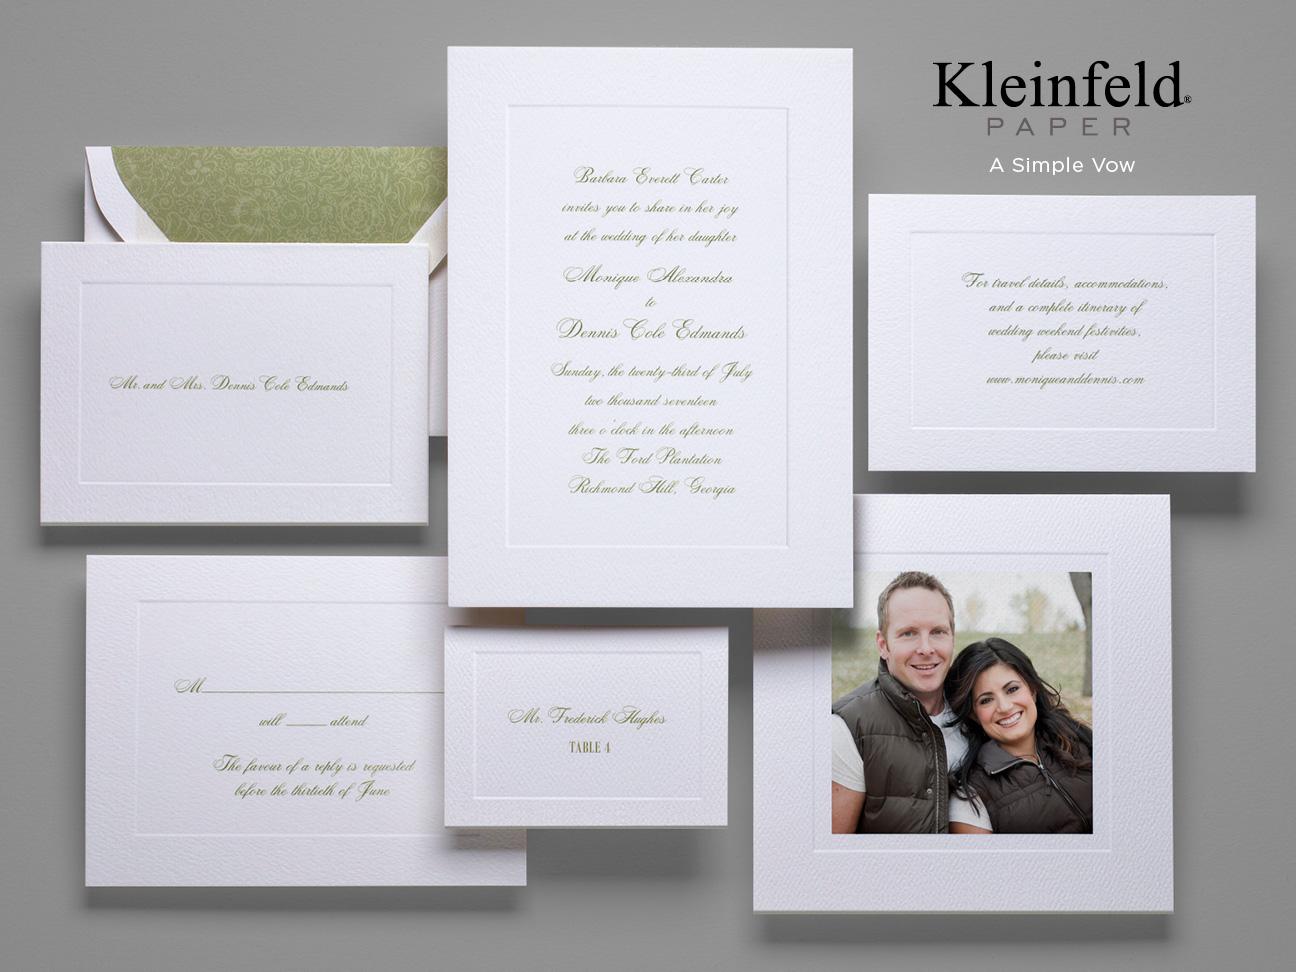 Kleinfeld Bridal